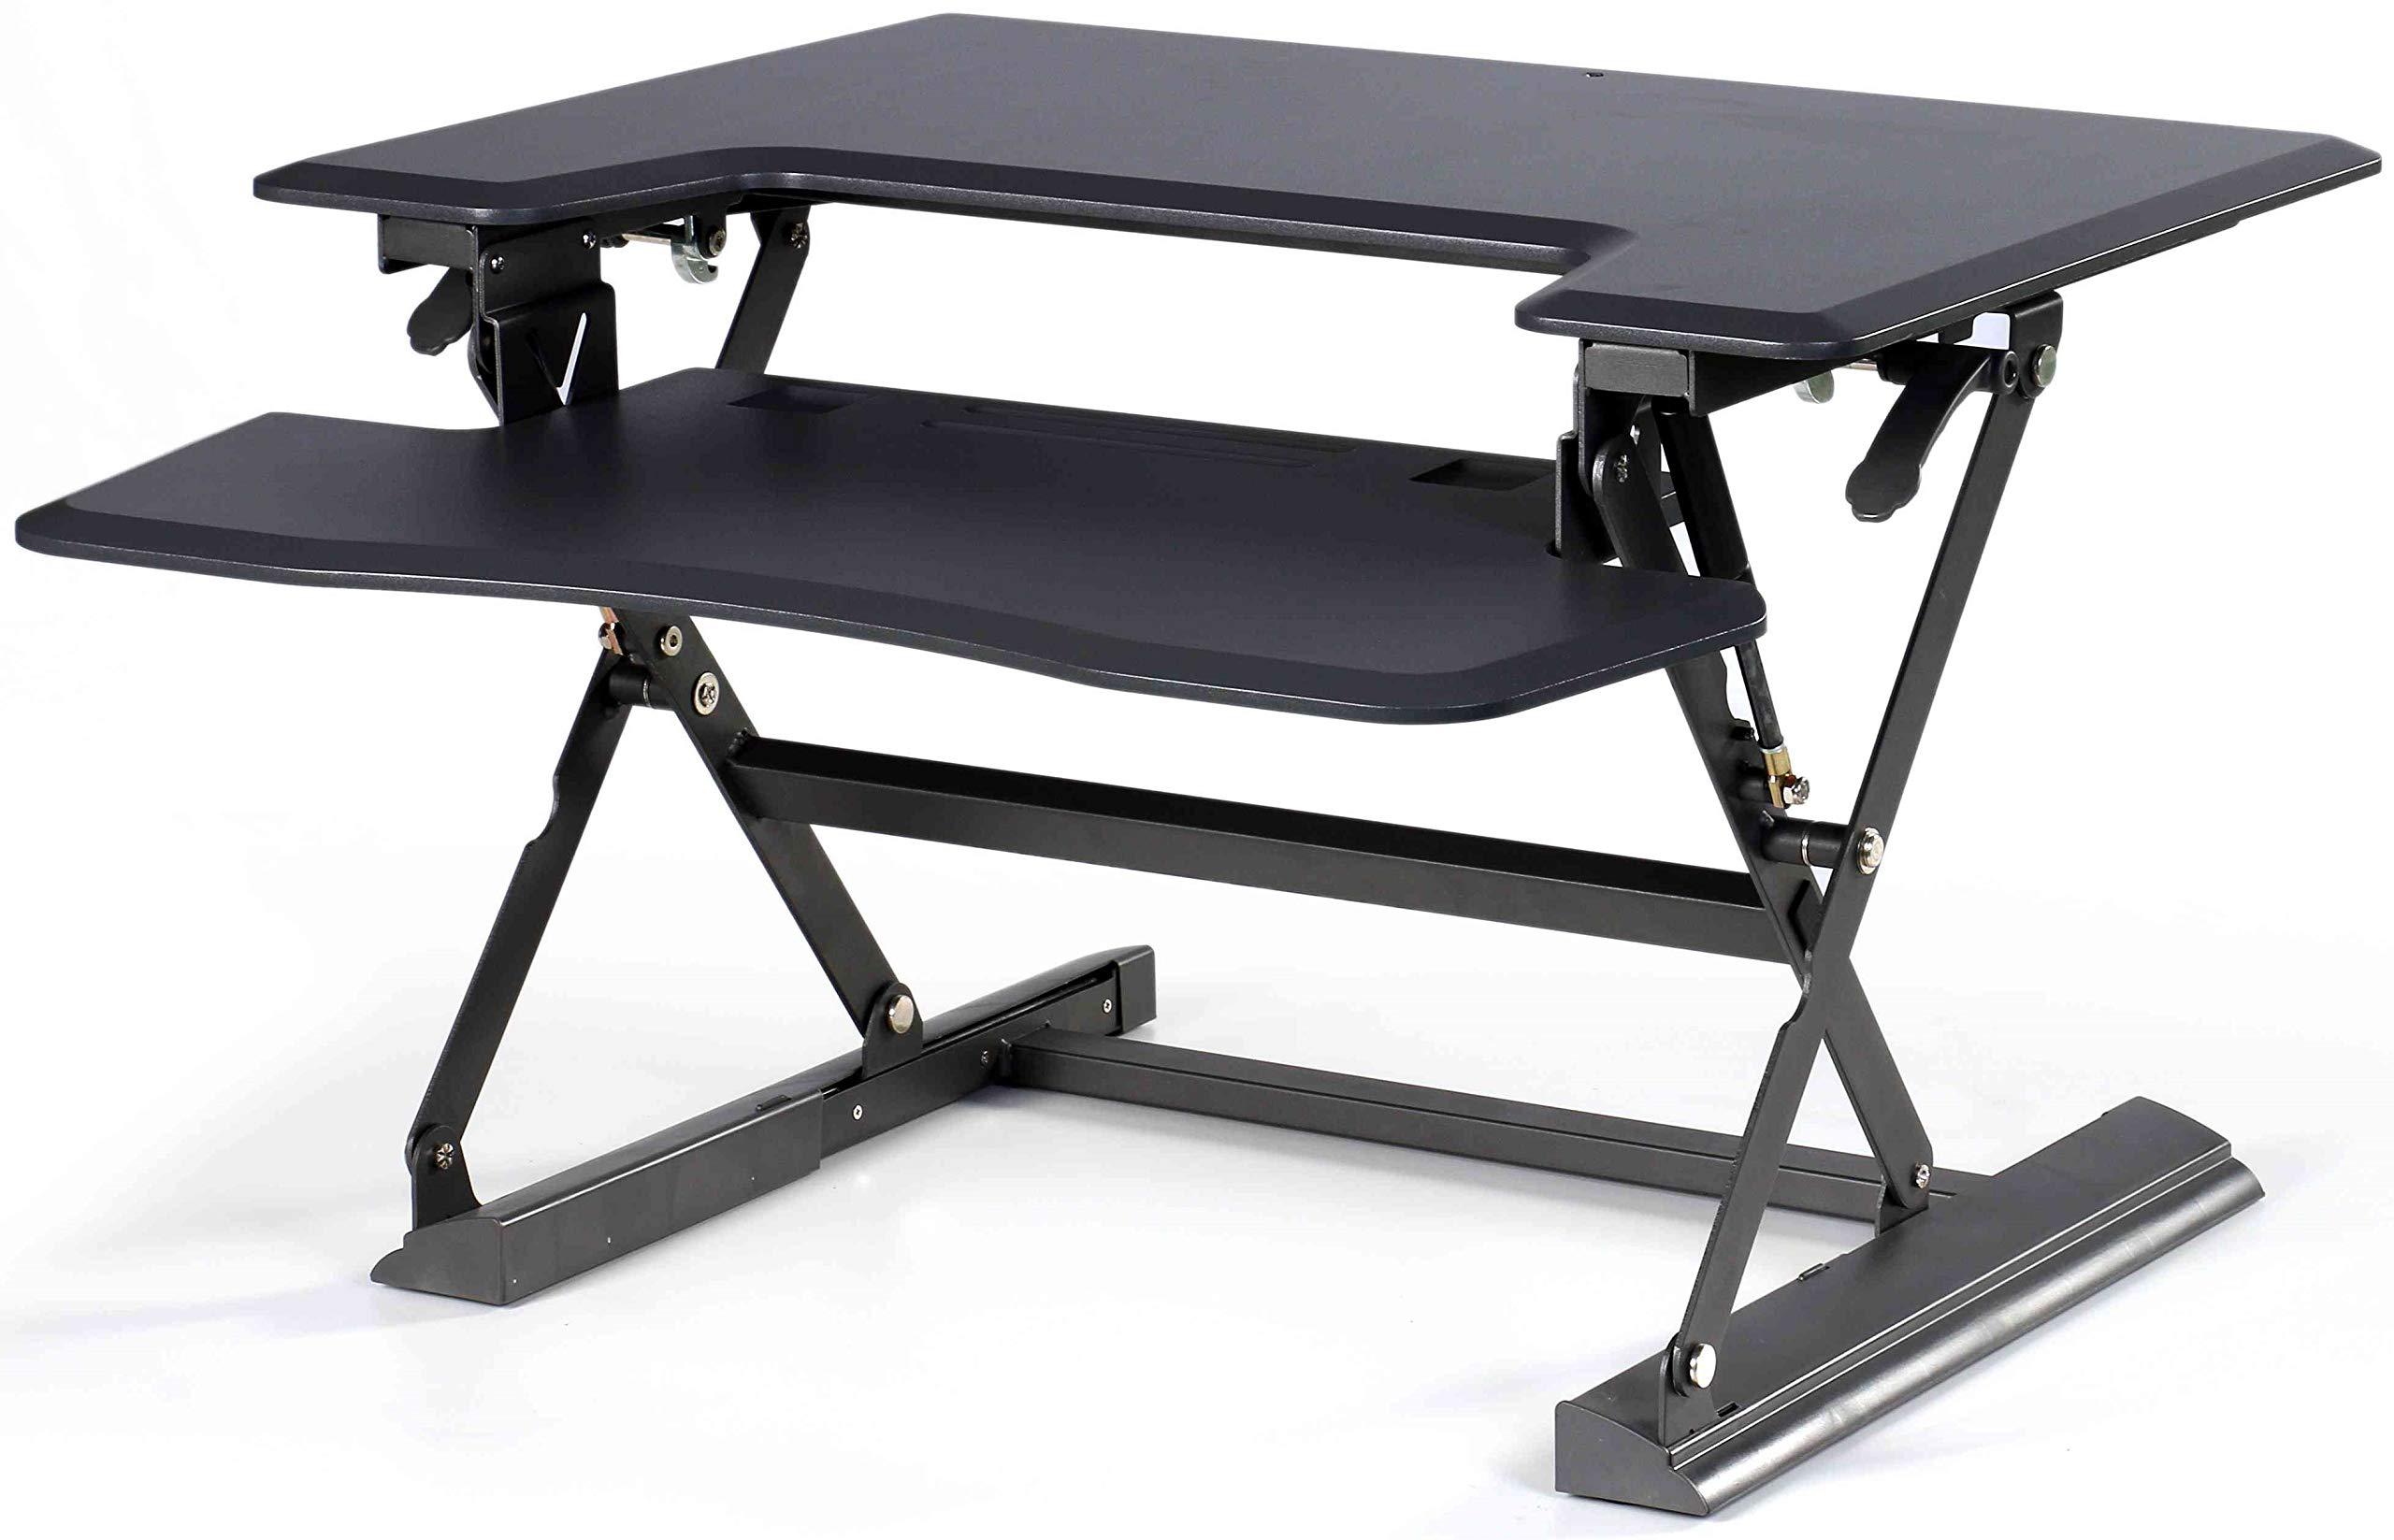 Hercke HDF Black Premium Standing Office Desk - Height Adjustable 36'' Wide Computer Desk with Easy-Action Levers - High Density Fiberboard Black - 66 lb Weight Capacity